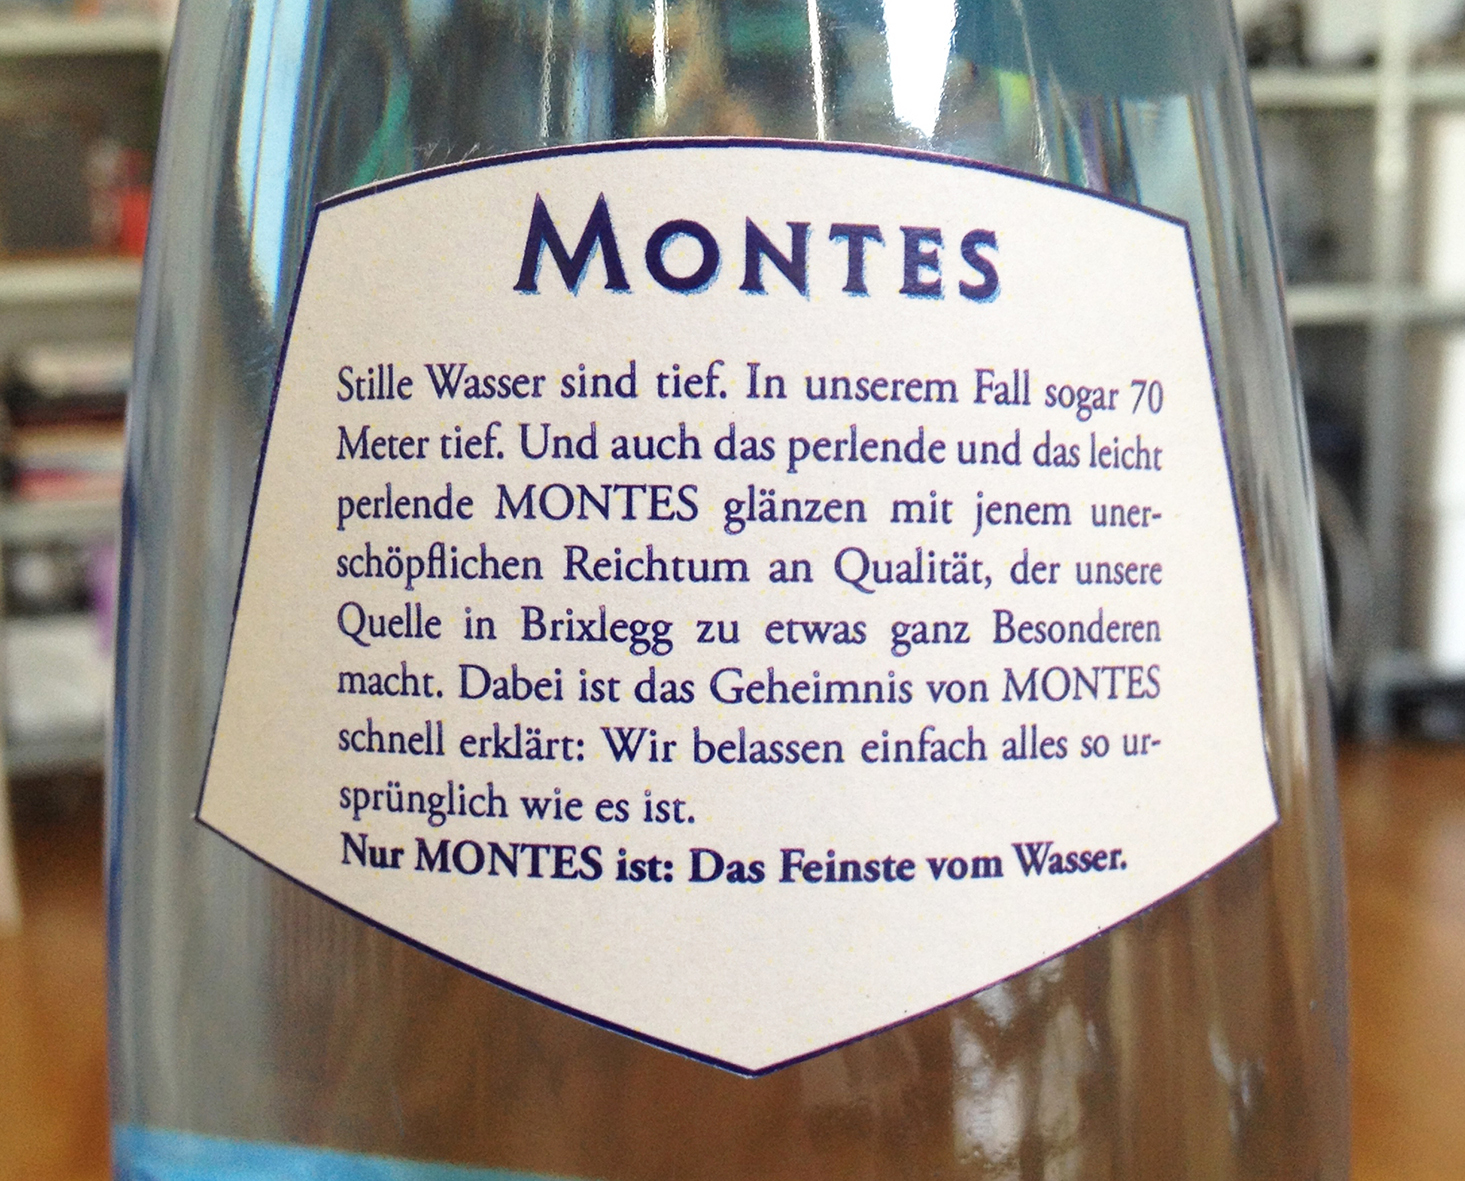 Montes | Etikettentext